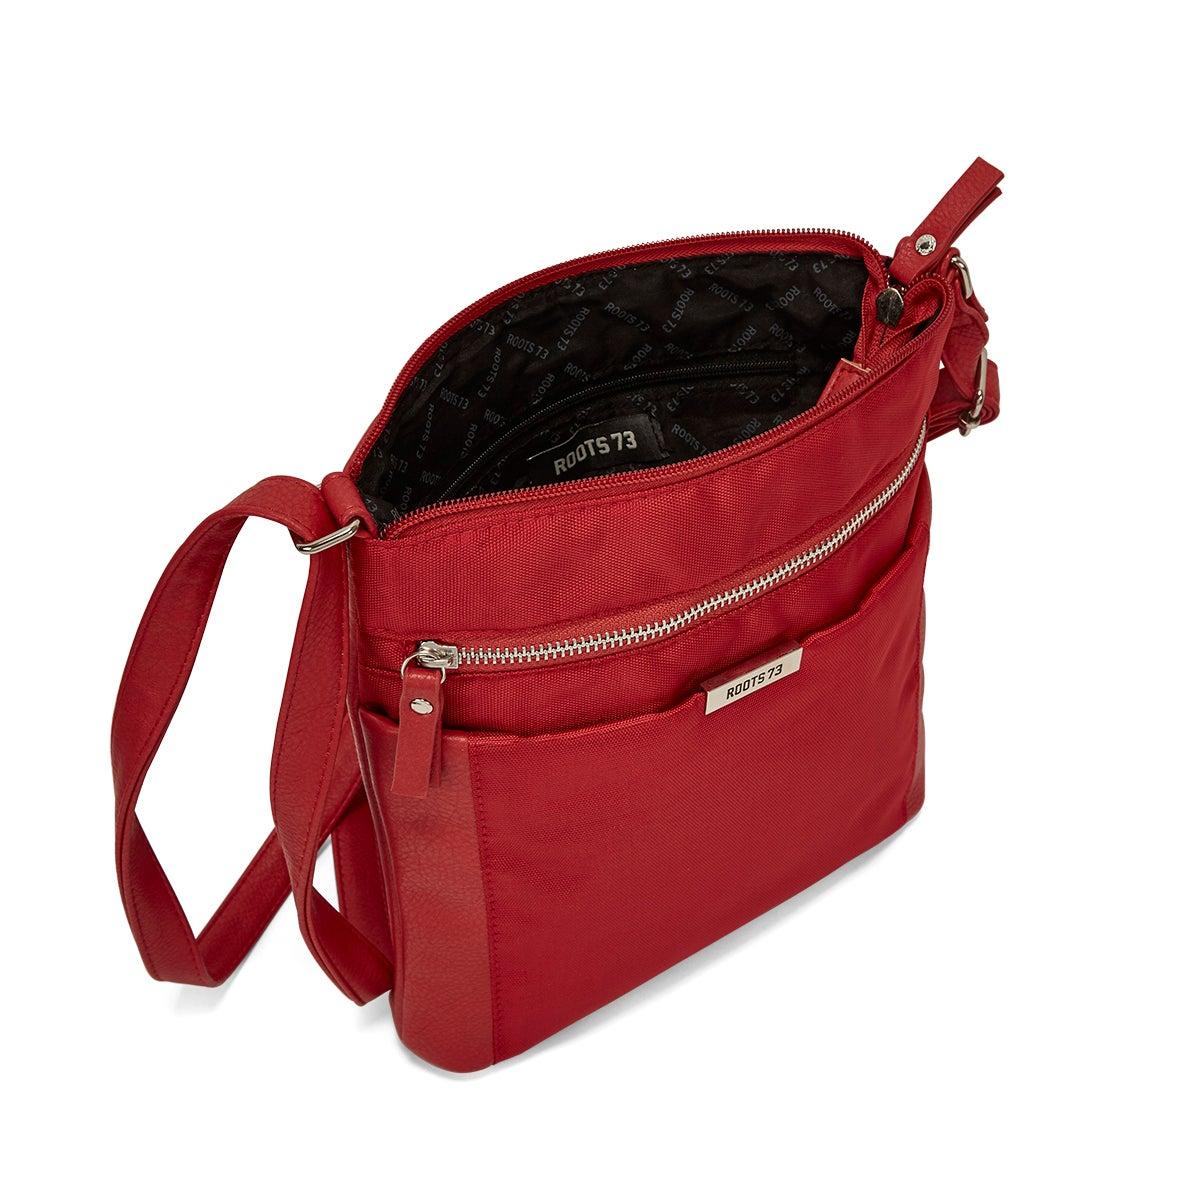 LdsRoots73 red north south crossbody bag